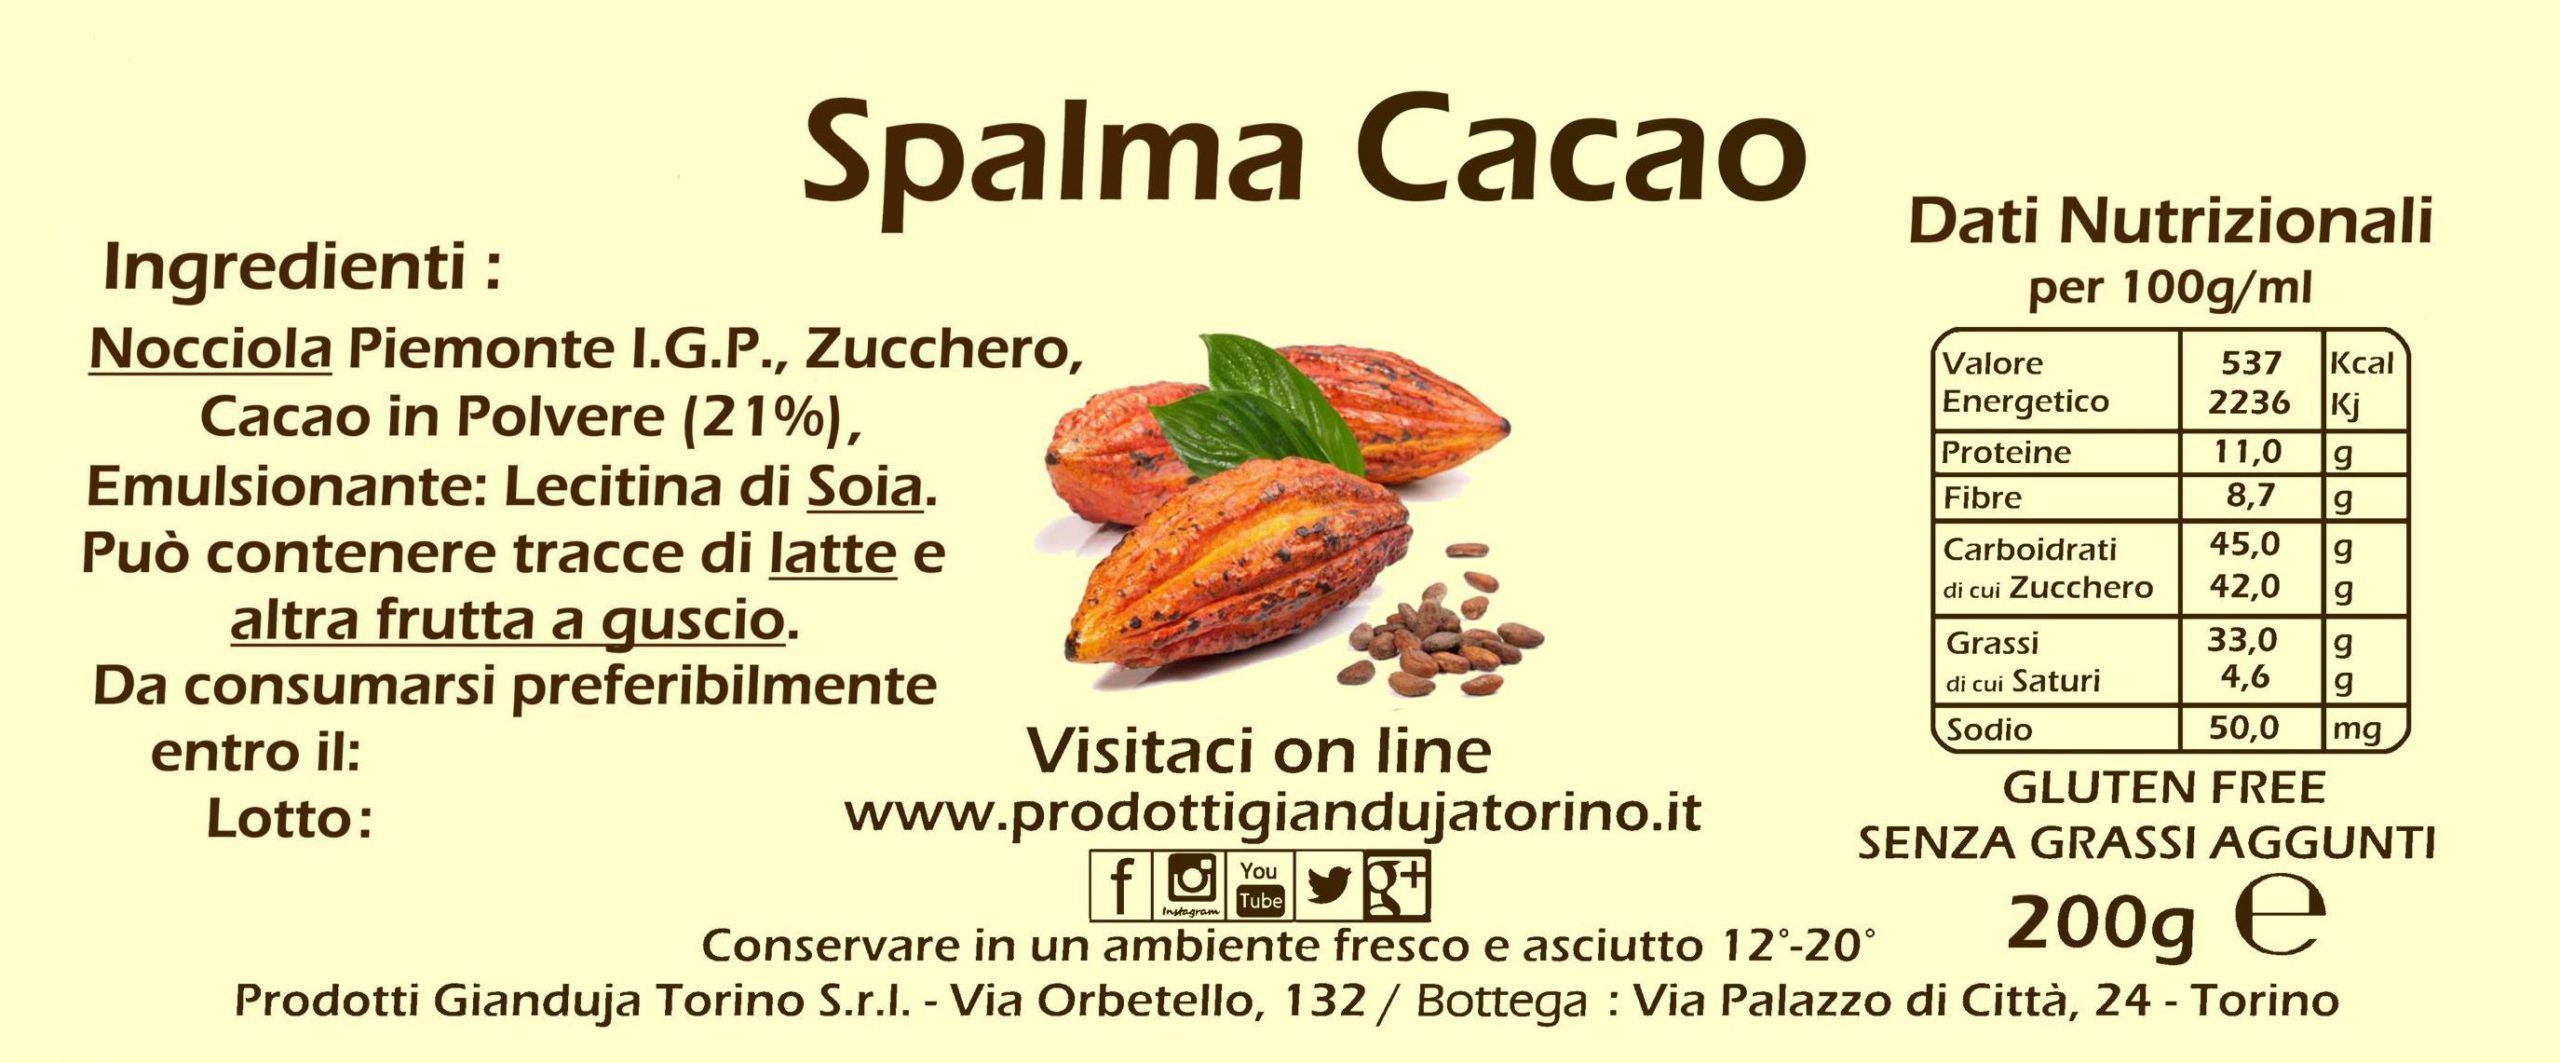 cacao spalmabile